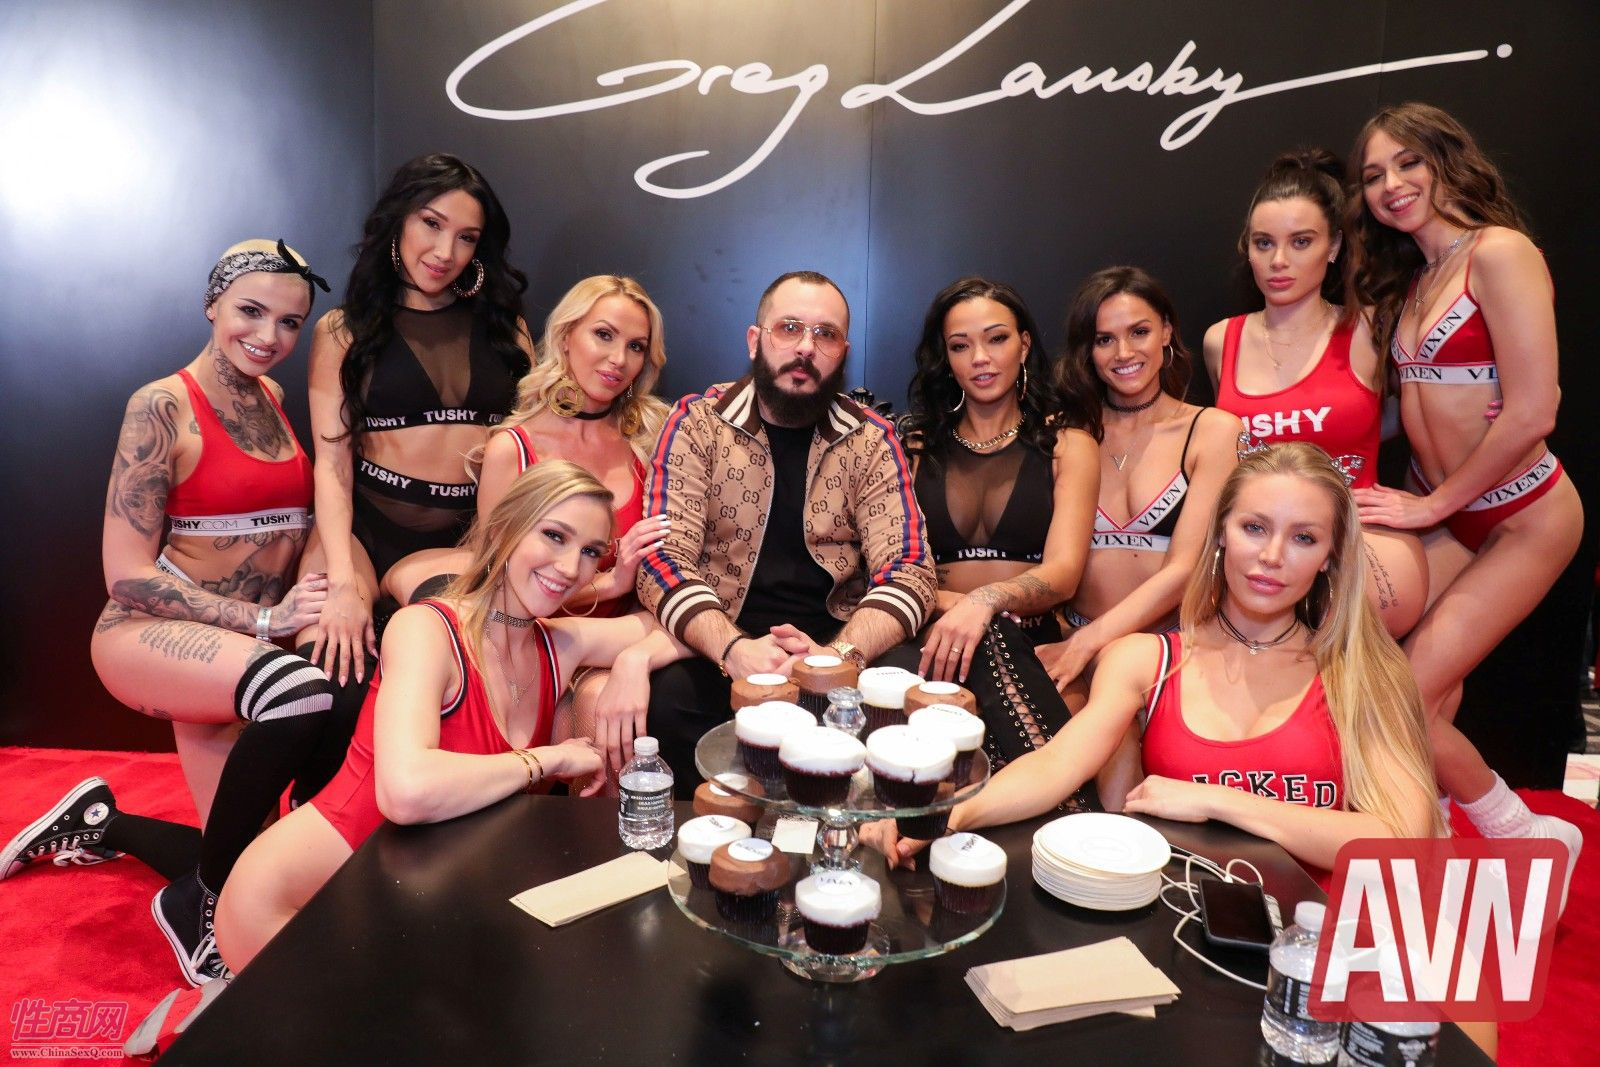 TUSHY成人视频网展台邀请了众多高颜值美女影星助阵。成人视频网站成为欧美互联网的一大热点,但成人视频服务在中国被法律禁止。